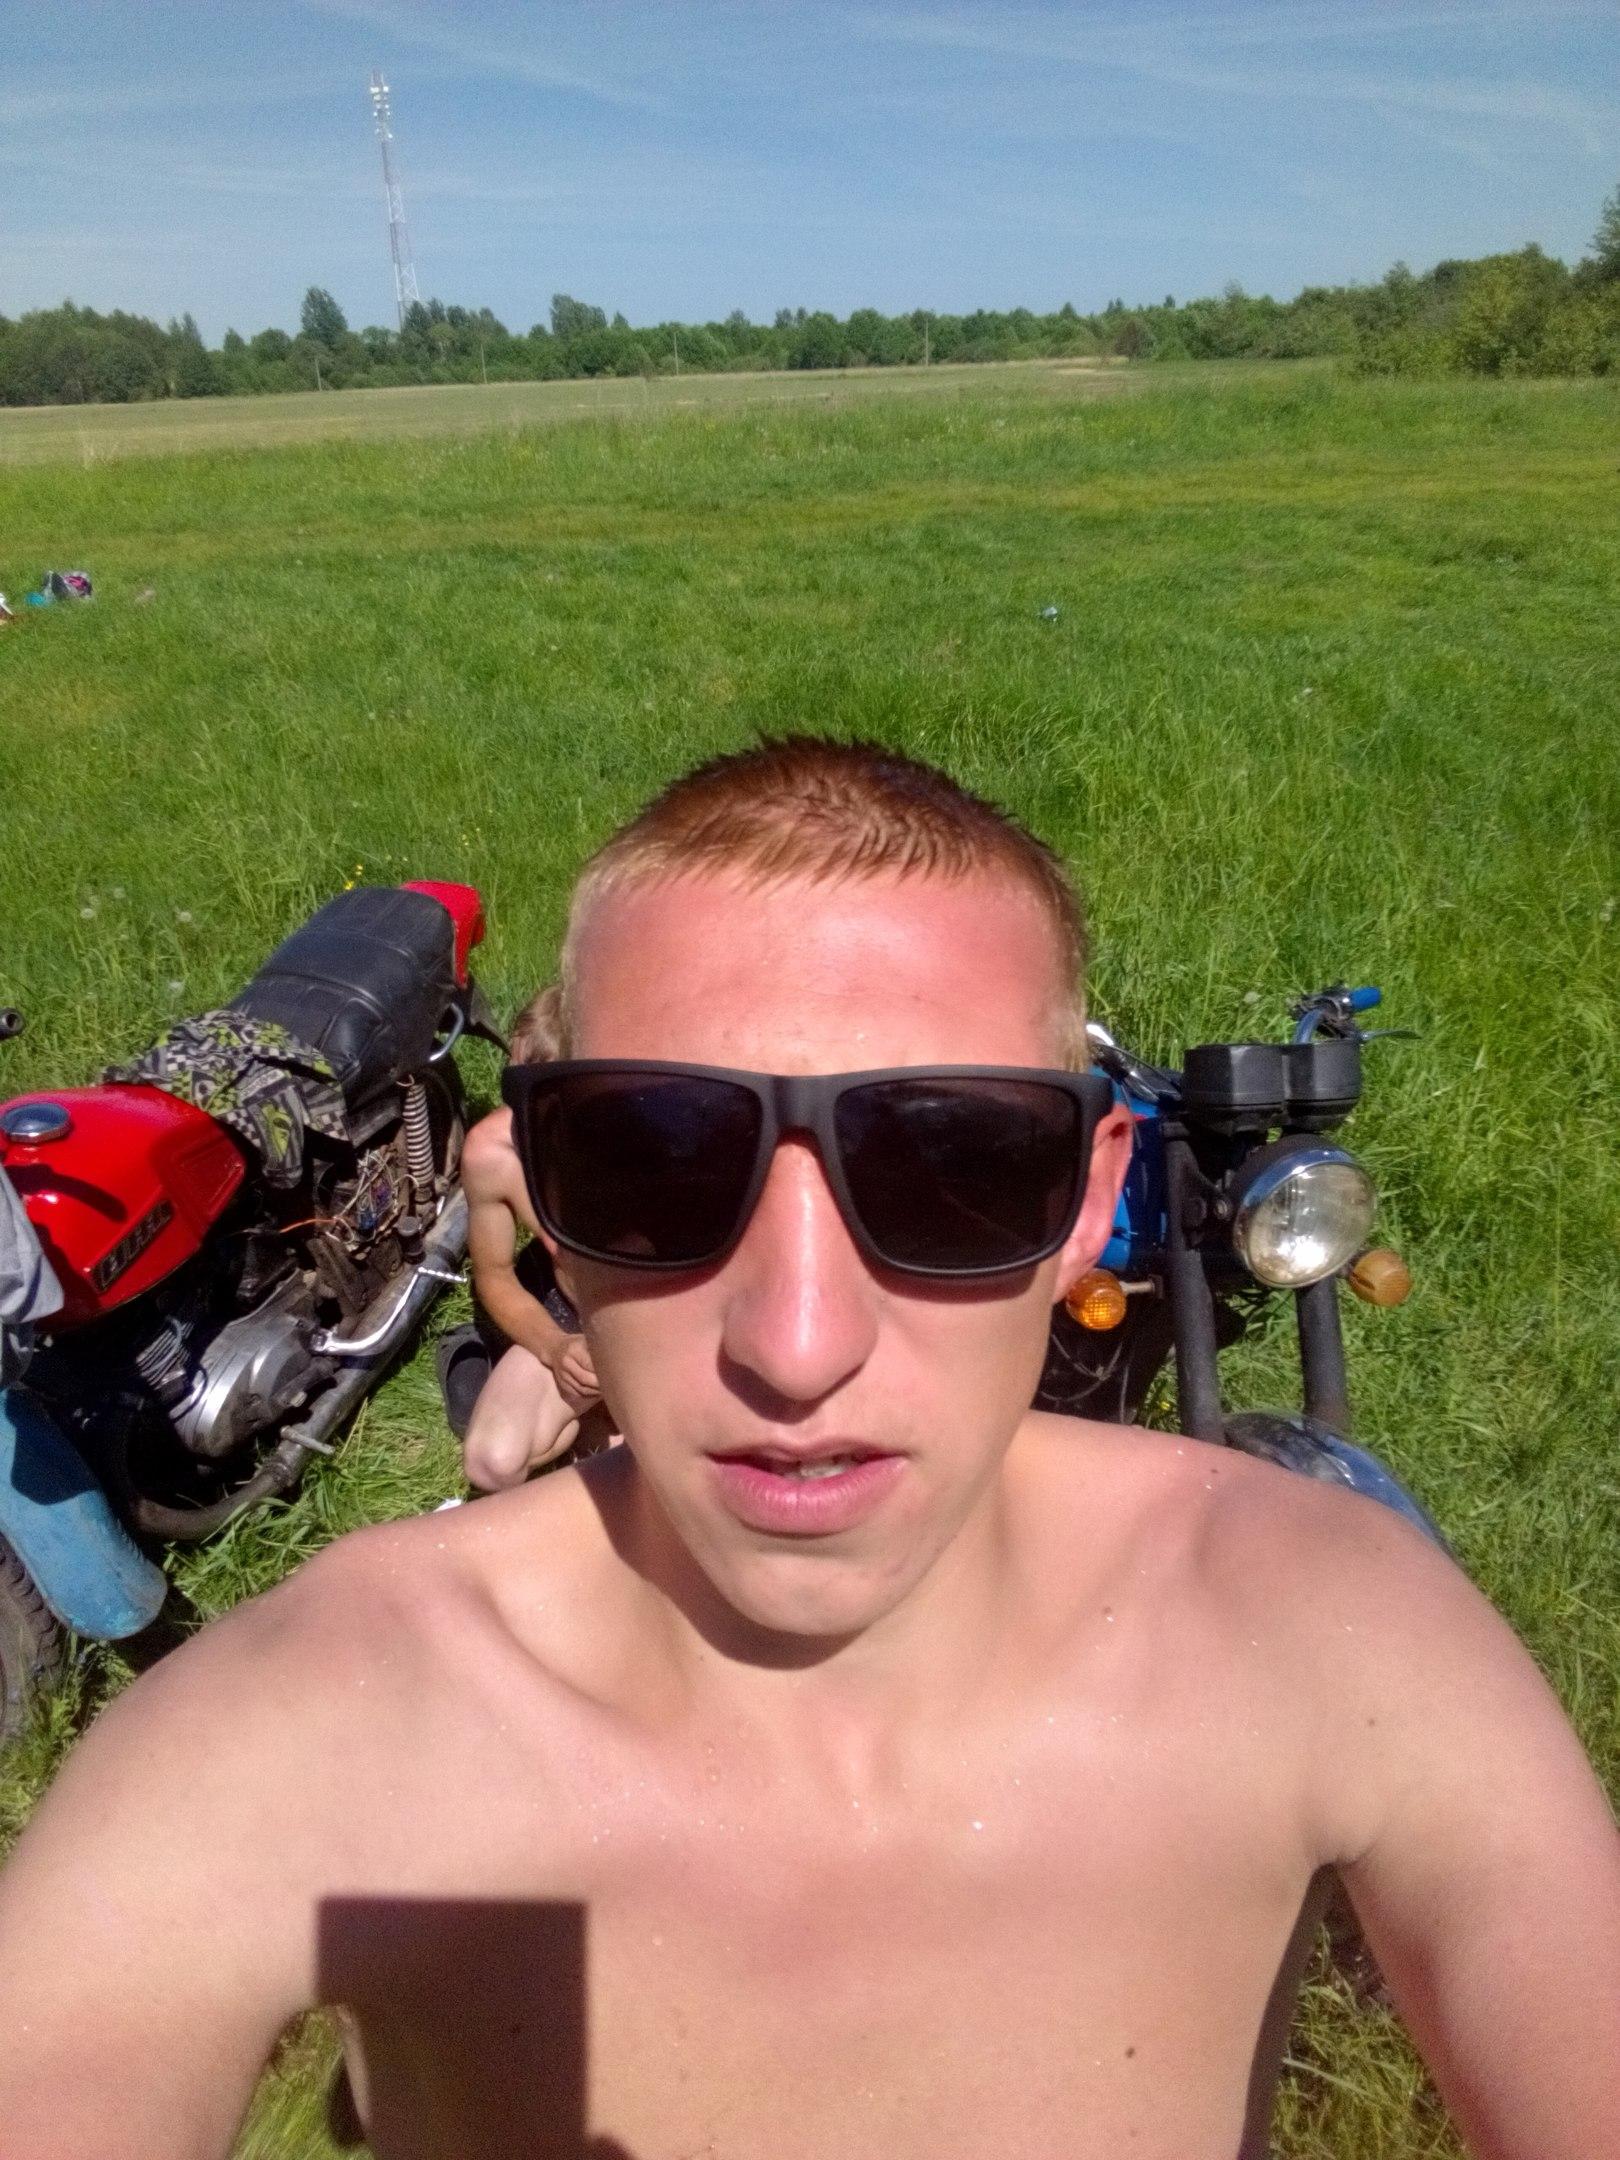 Igor, 20, Polatsk